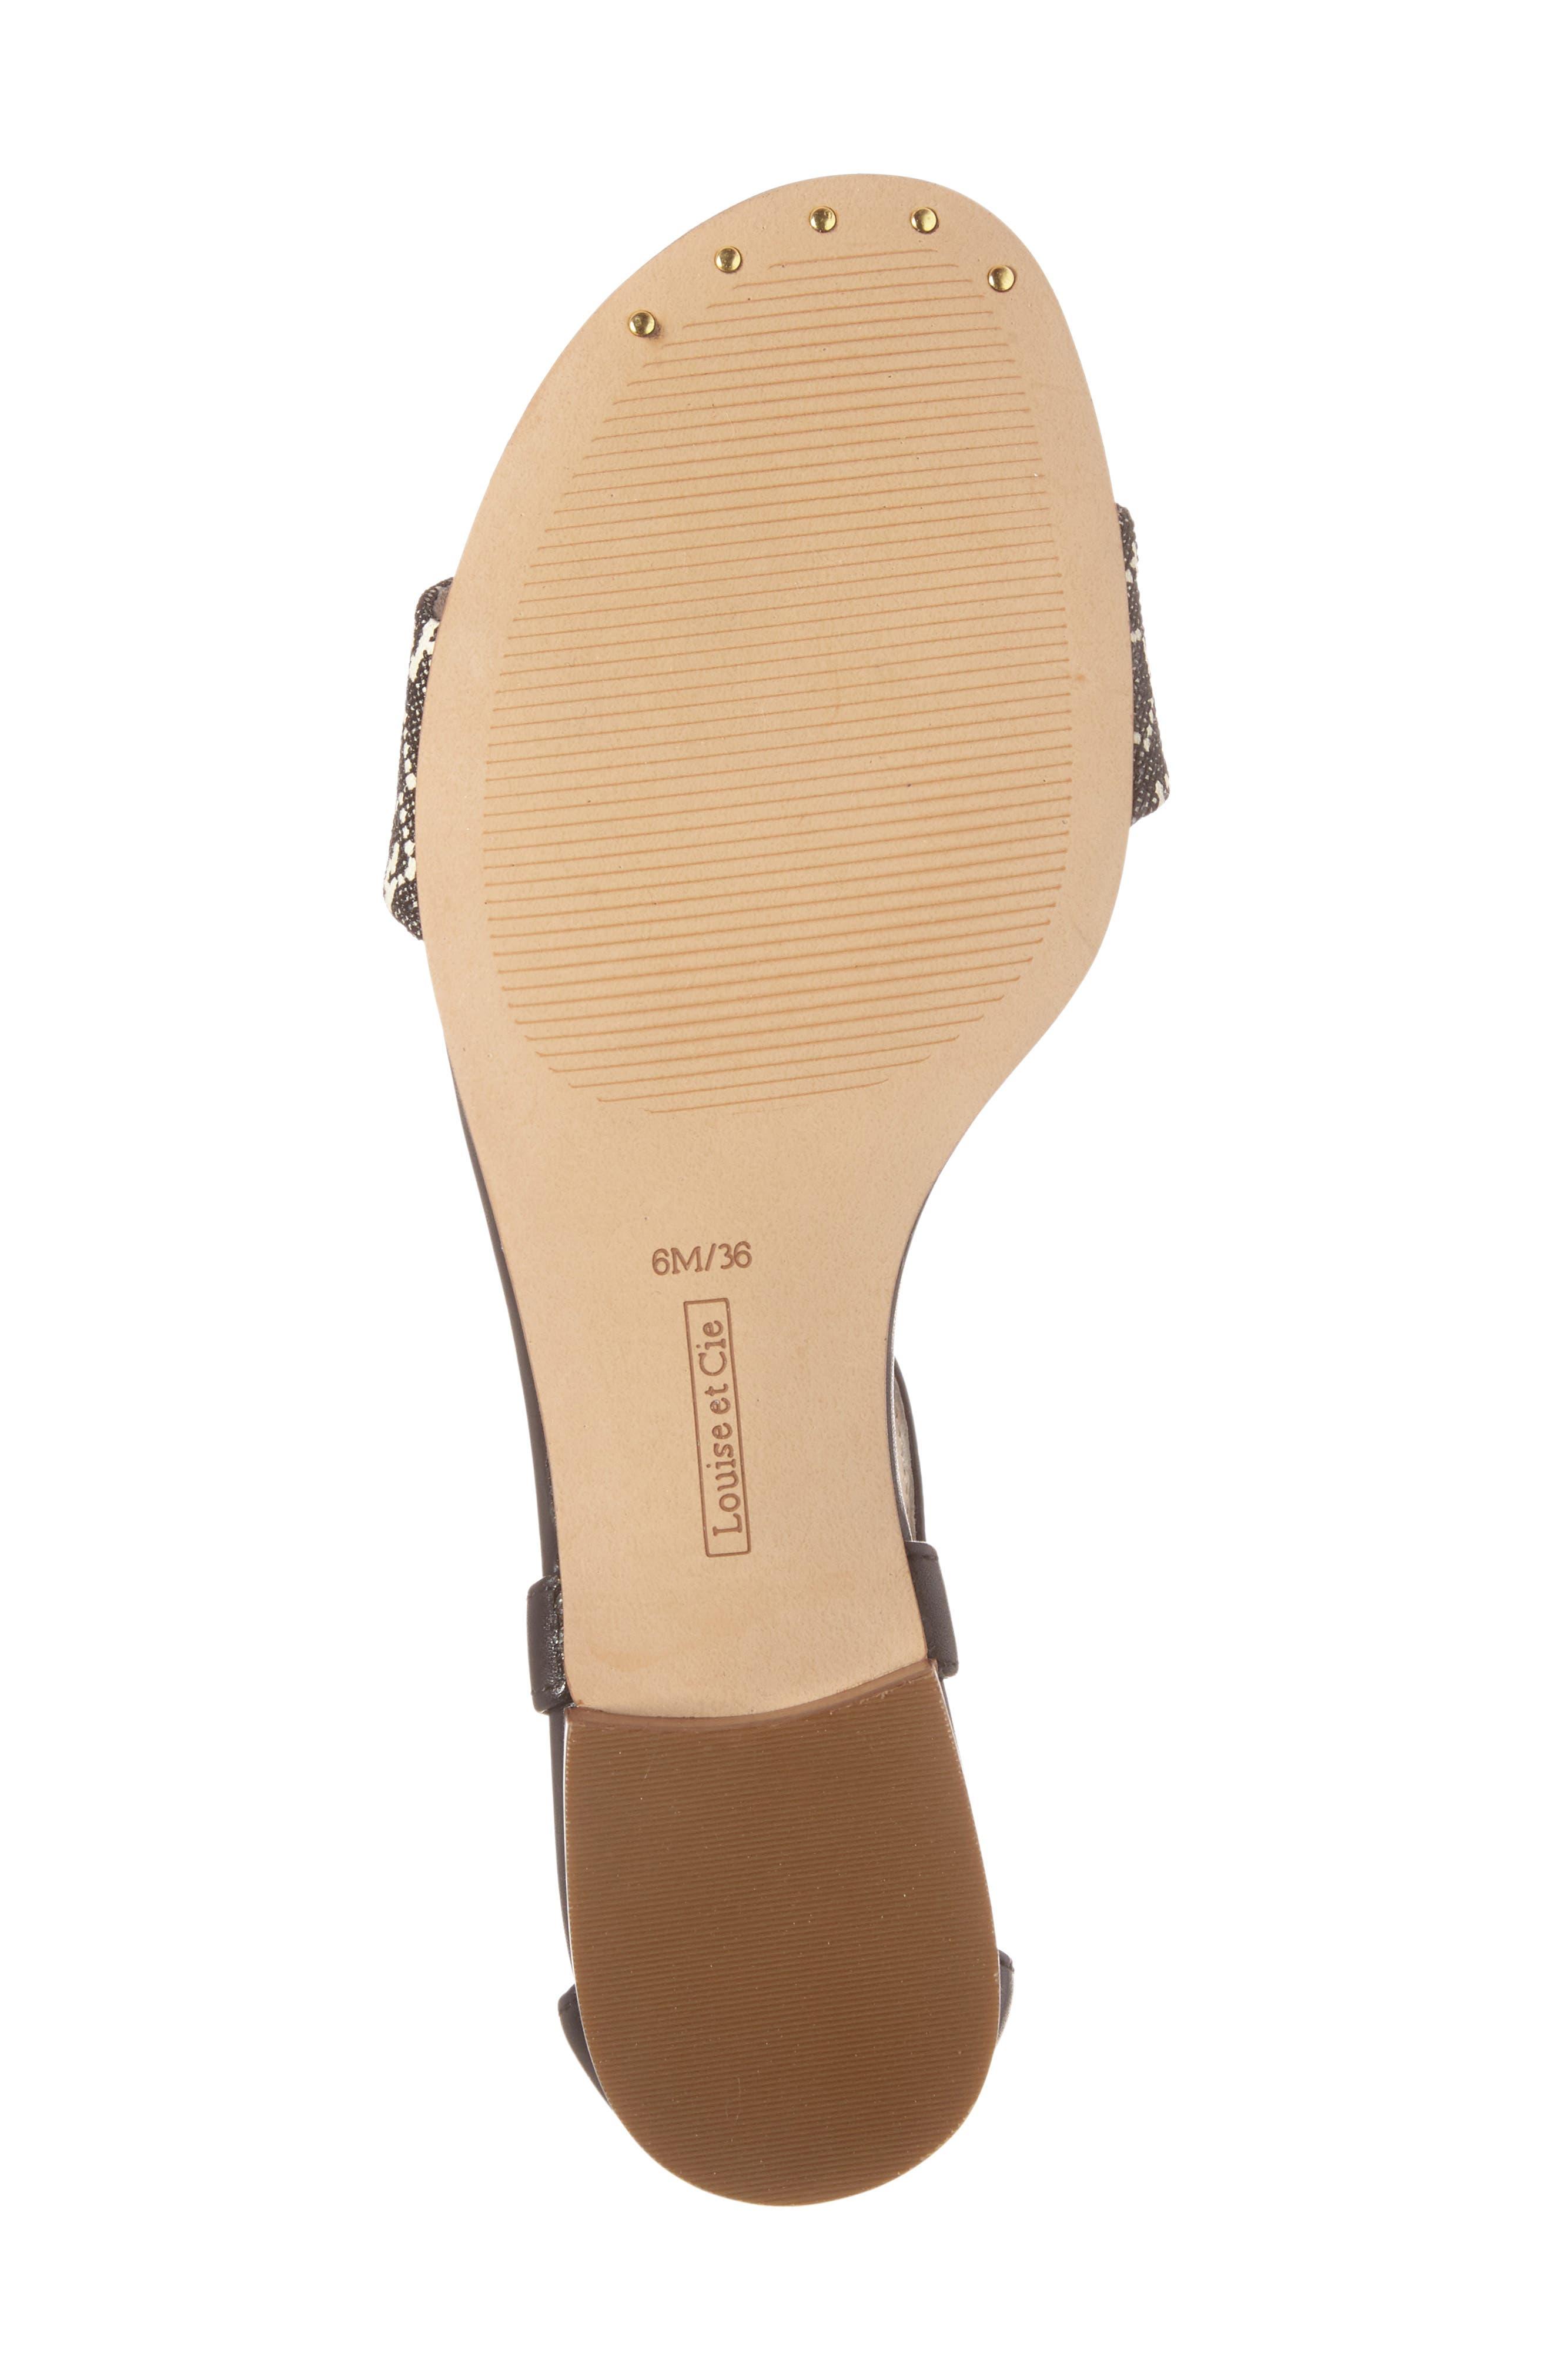 Adley Ankle Strap Sandal,                             Alternate thumbnail 4, color,                             002